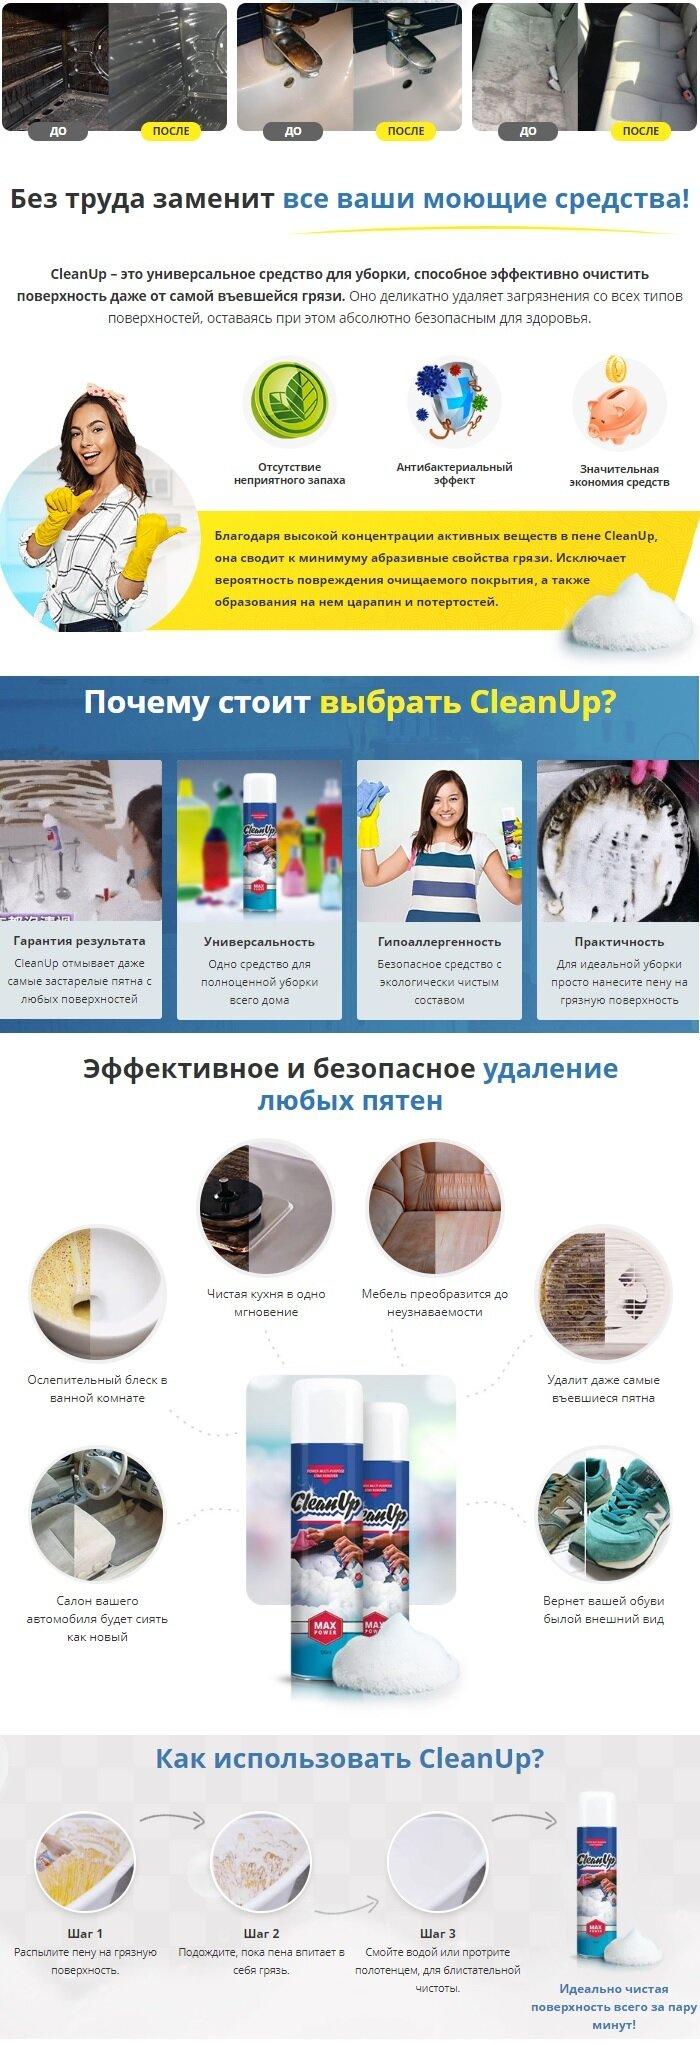 Чистящее средство CleanUp